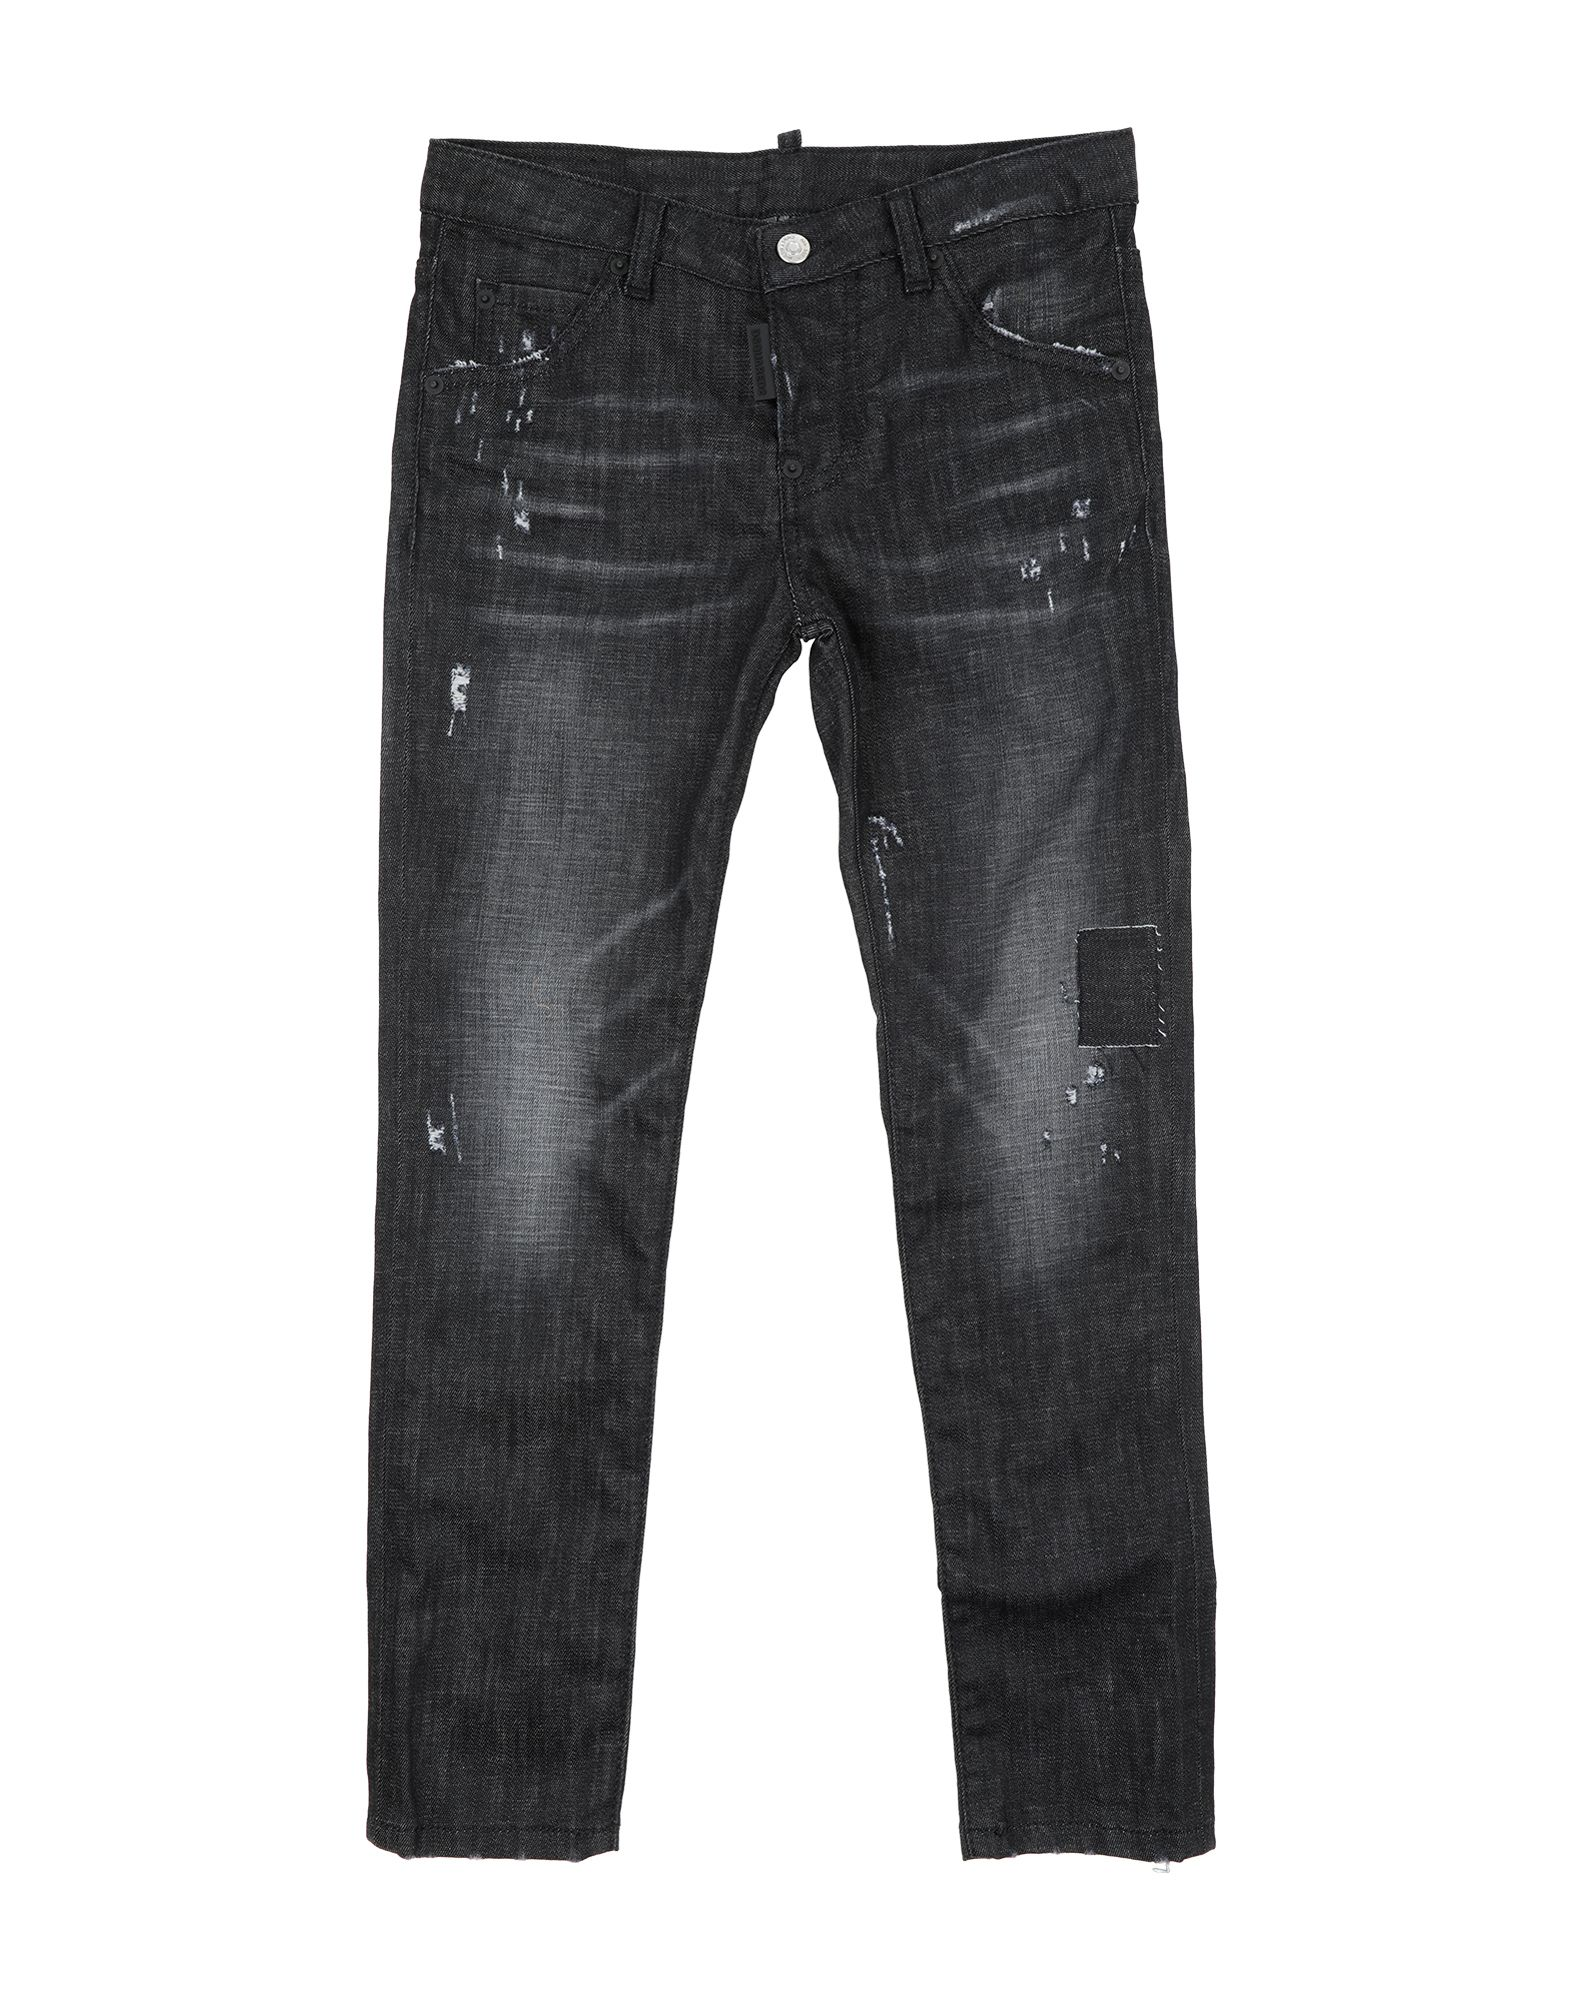 Denims Et Jeans Fille Junior 9 Dsquared2 Ans 16 uJT3lK1cF